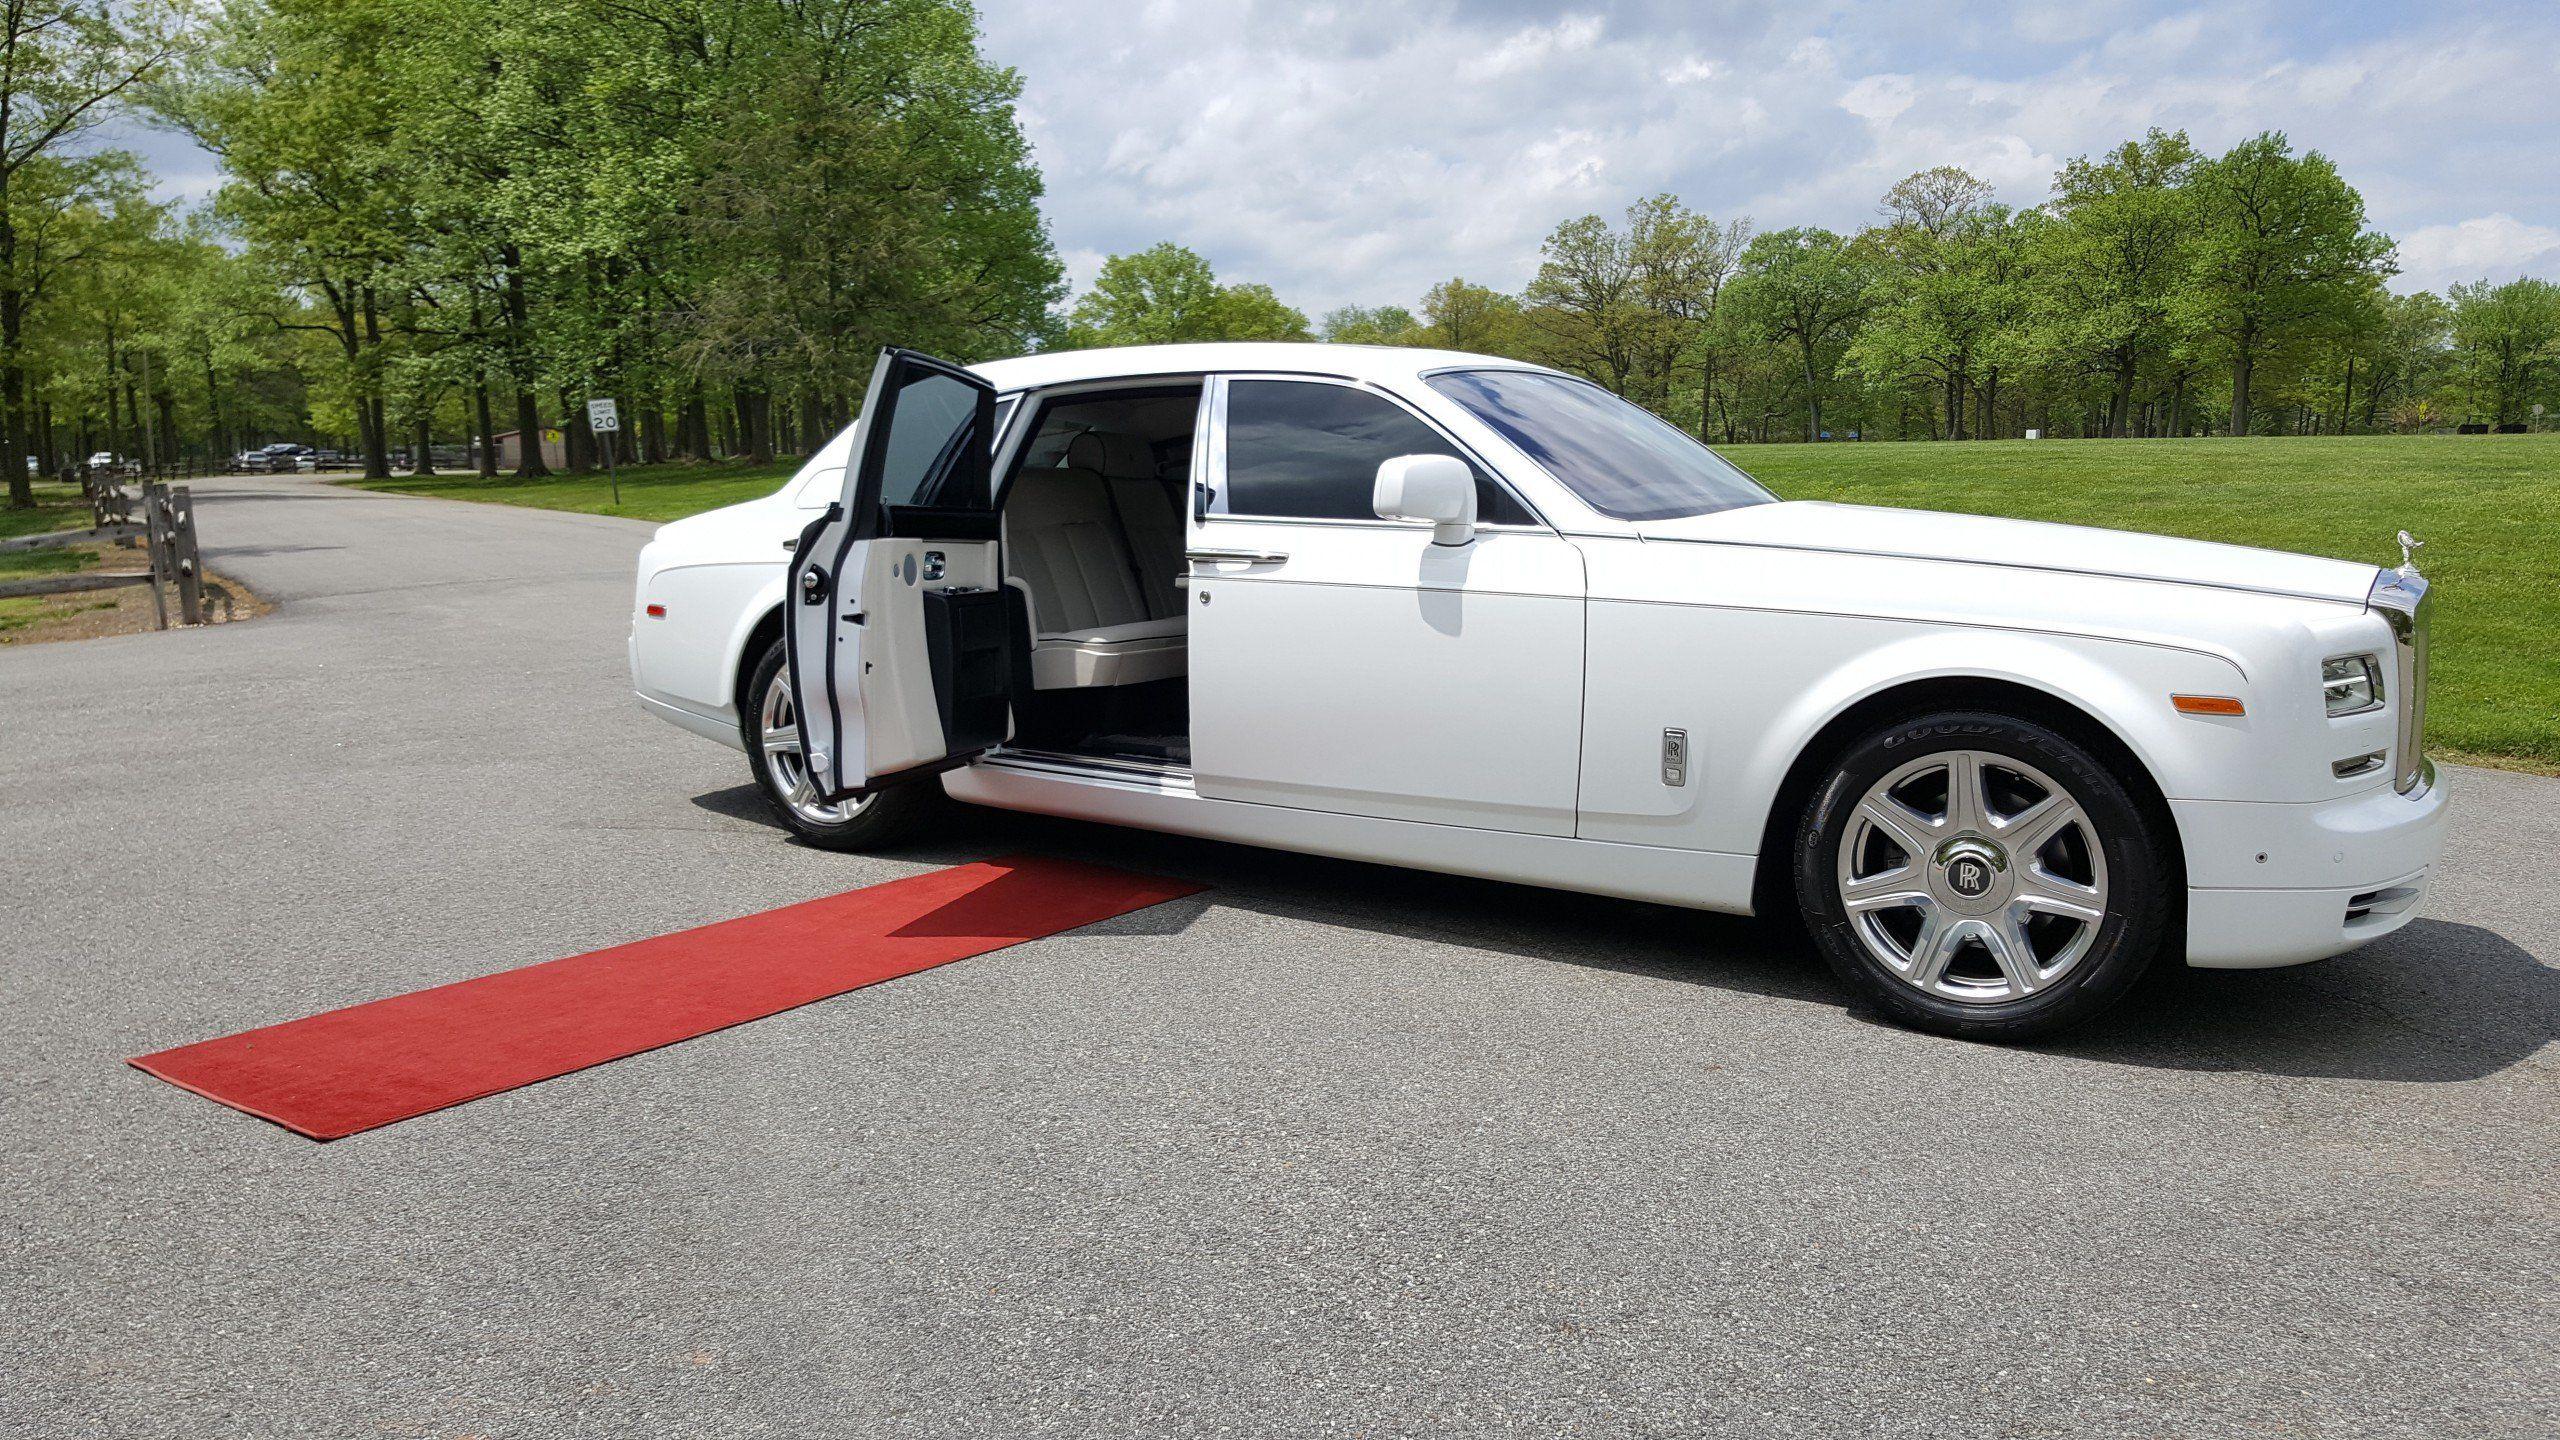 Rolls Royce Phantom Limo Rental In New Jersey Santos Vip Limousine